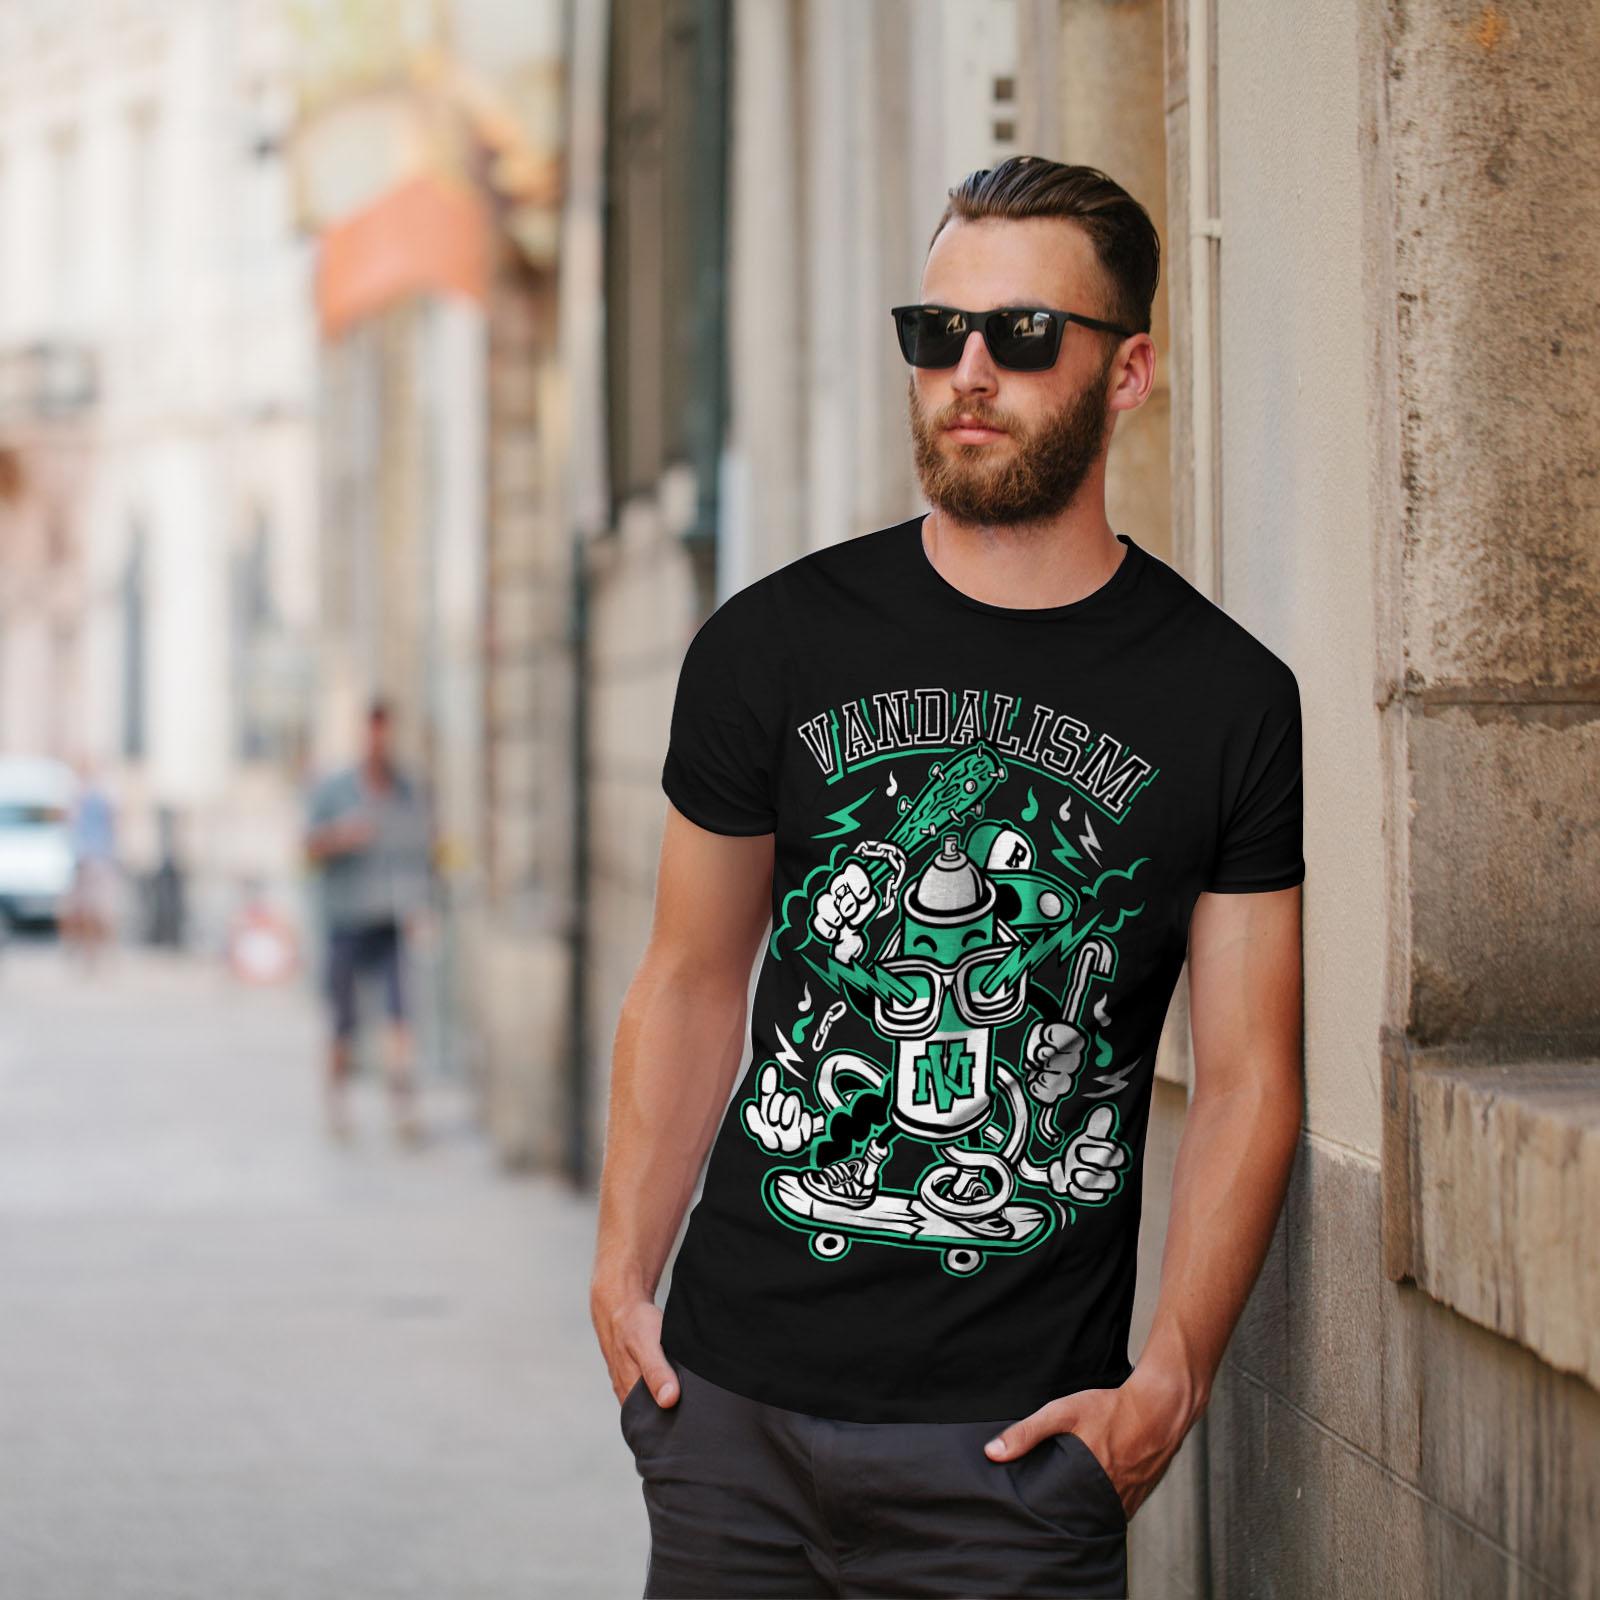 Youth Graphic Design Printed Tee Wellcoda Street Vandalism Mens T-shirt